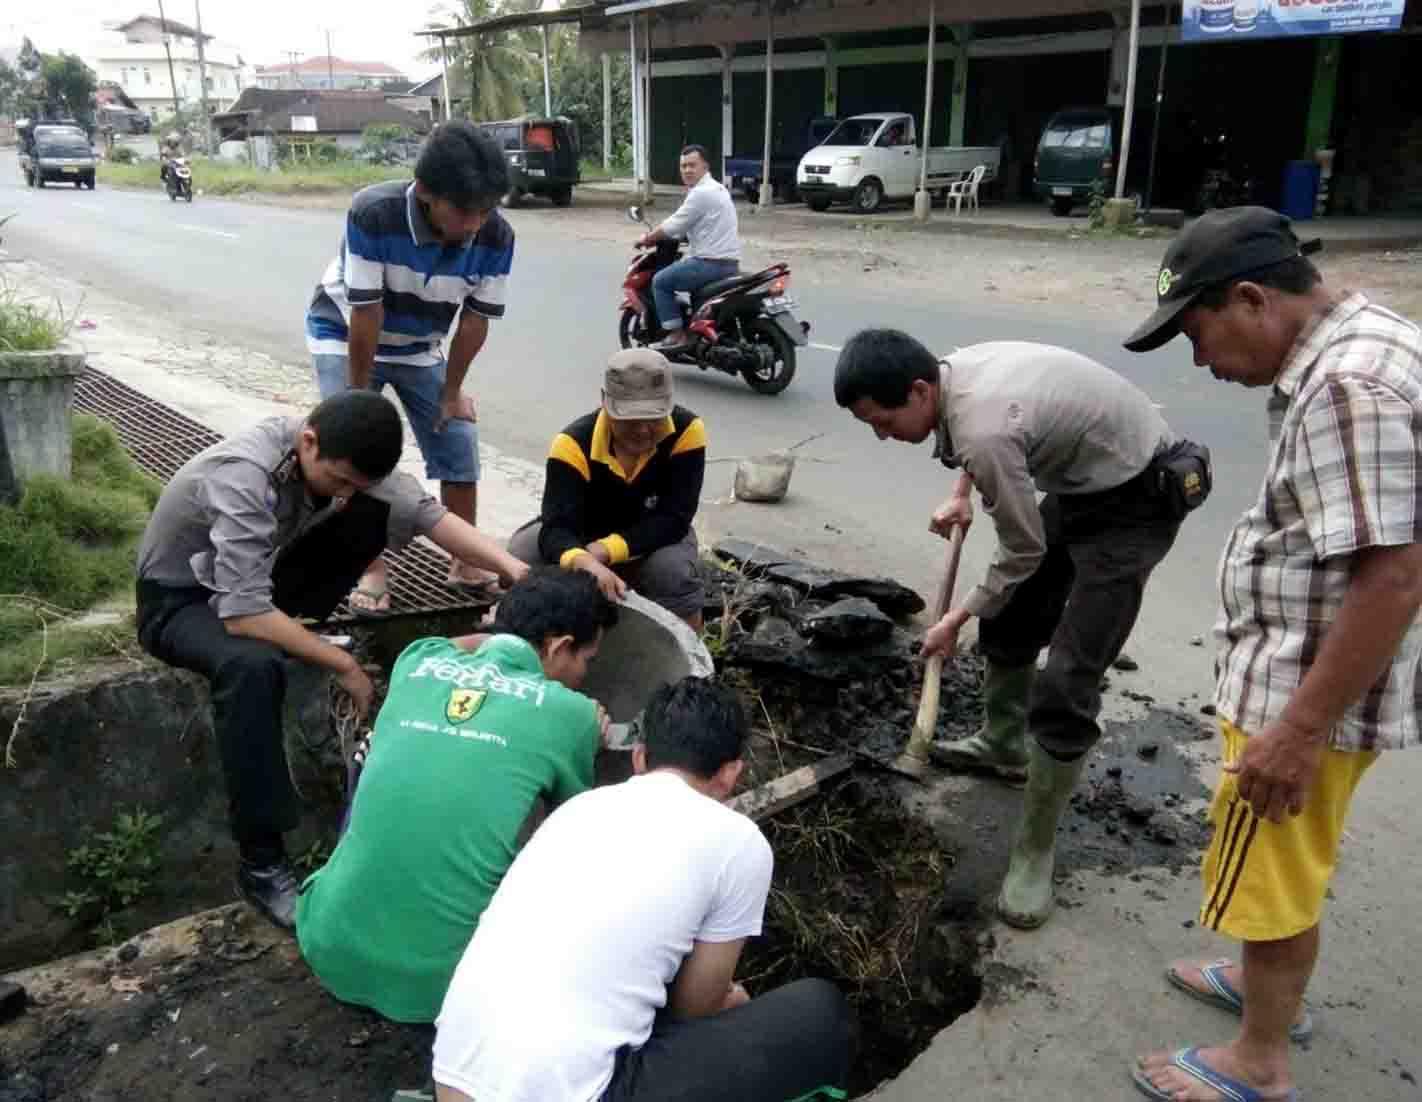 Polisi Gotong Royong Bersama Warga Perbaiki Gorong Gorong Selokan